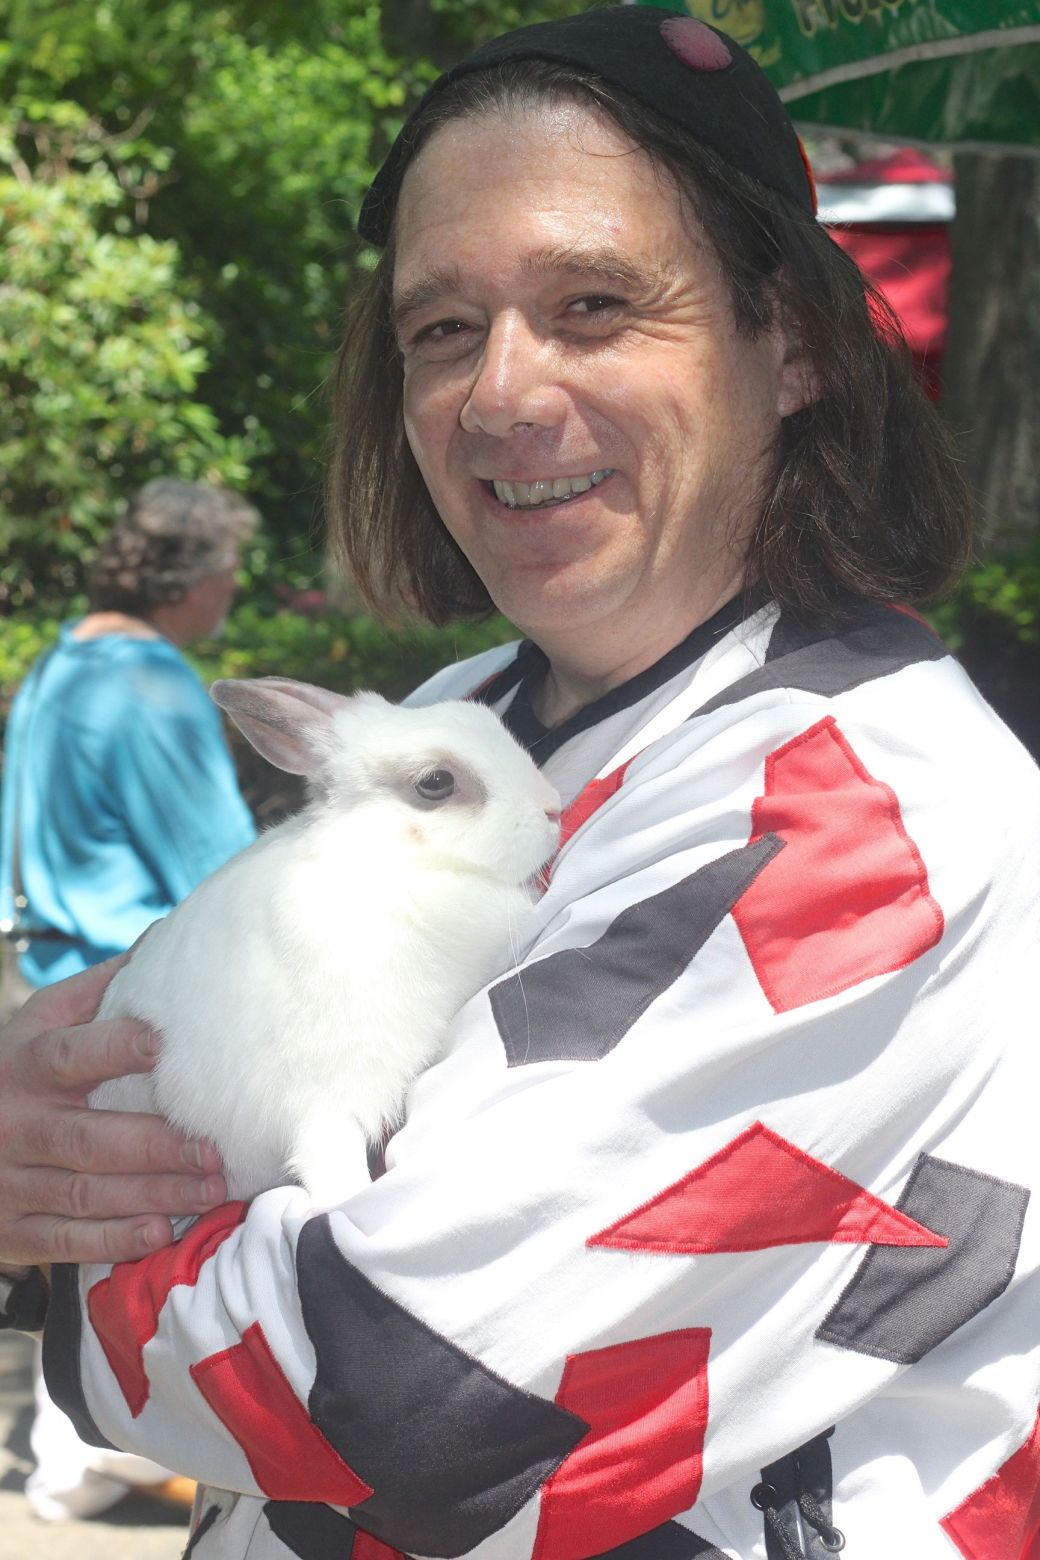 gloucester hammond castle renaissance fair man with rabbit